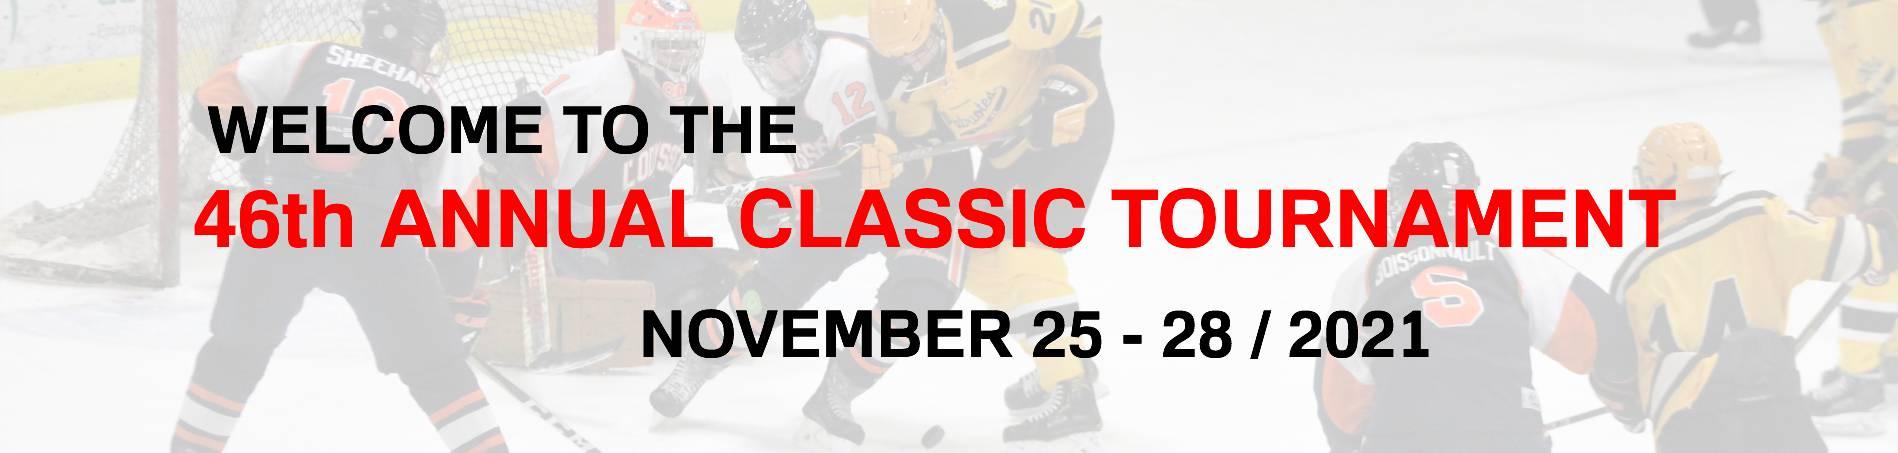 Annual Classic Tournament